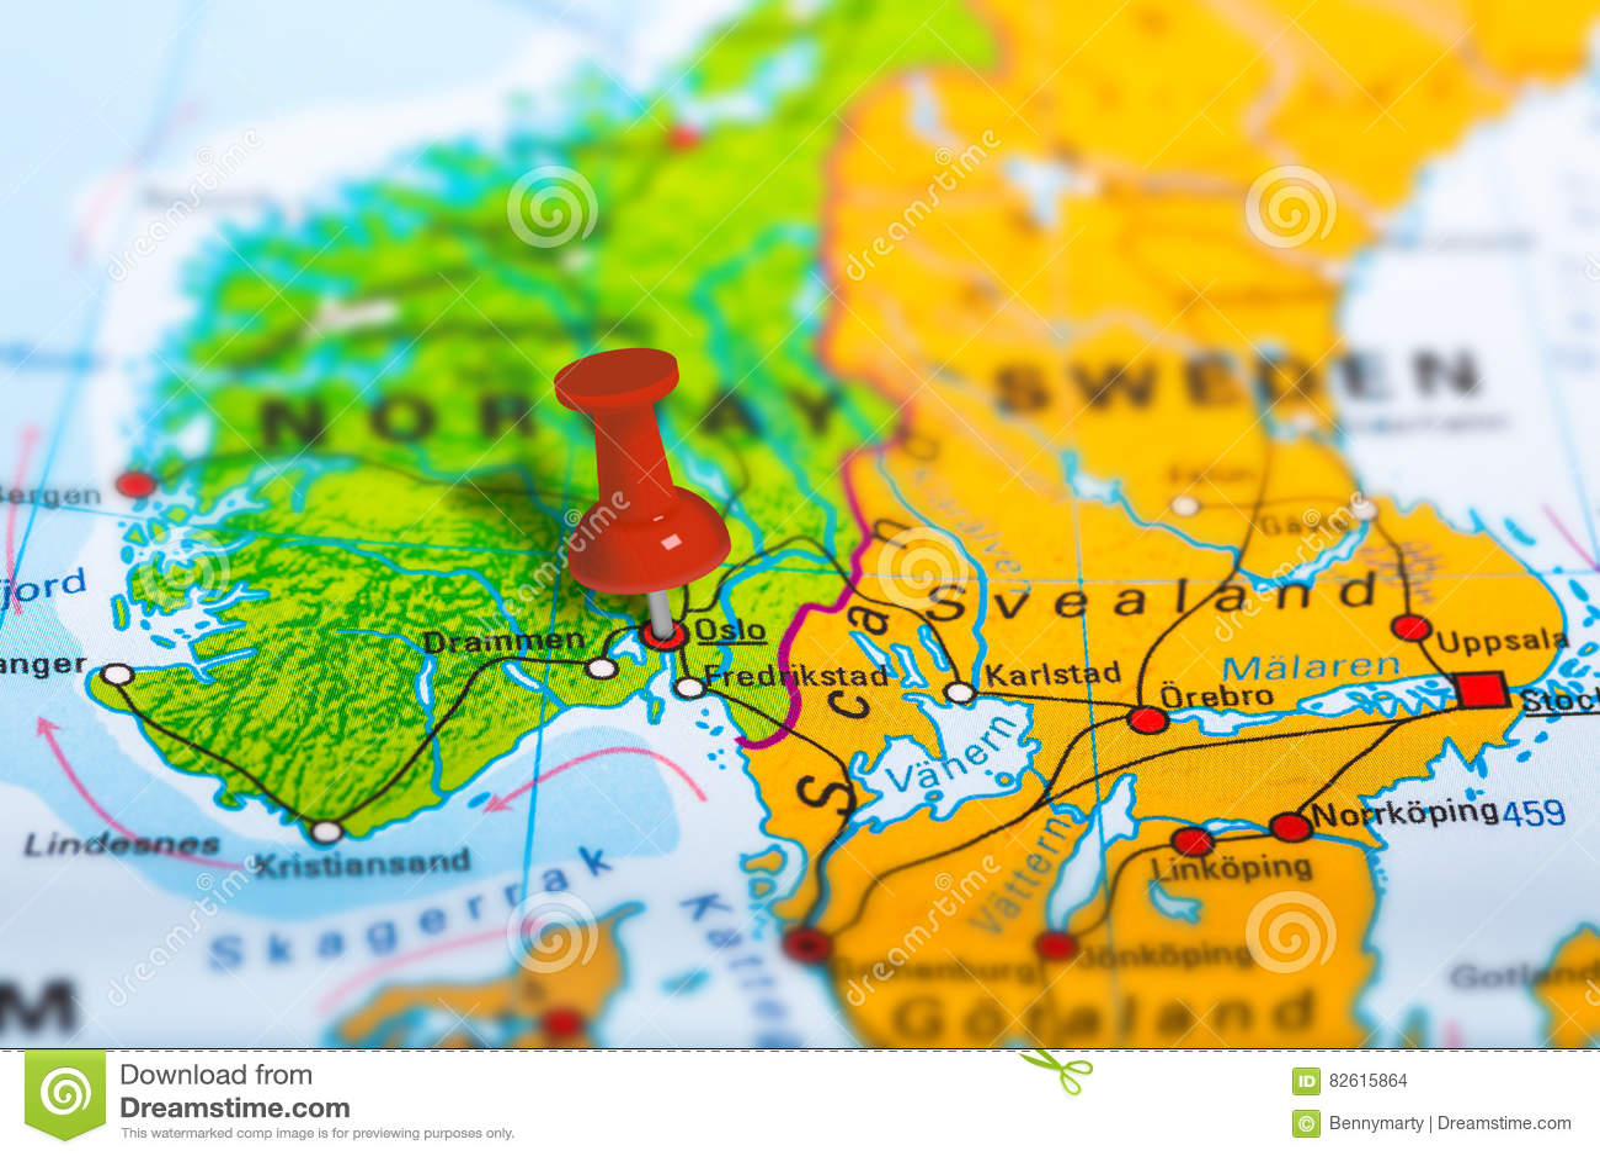 La Cartina Della norvegia